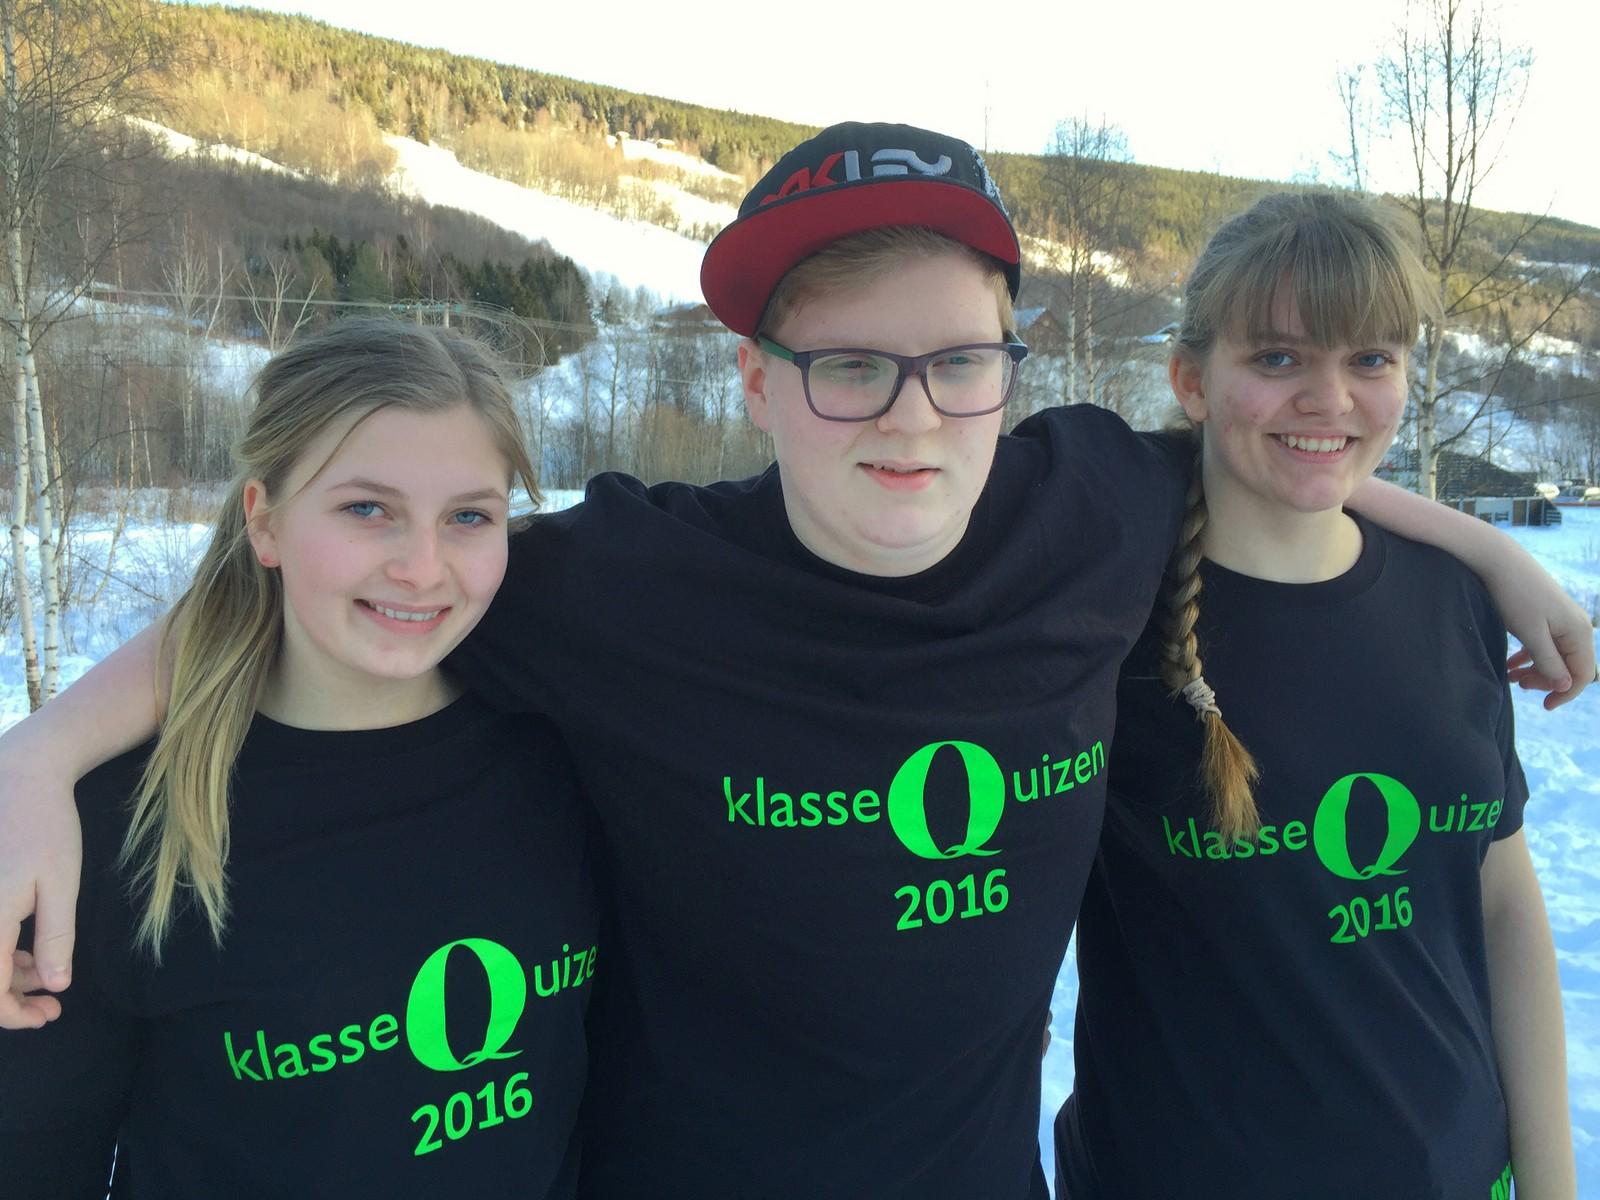 Marita Walheim, Marius Øygard og Cornelia Randen Nordlien fra Heidal skule fikk ni poeng.